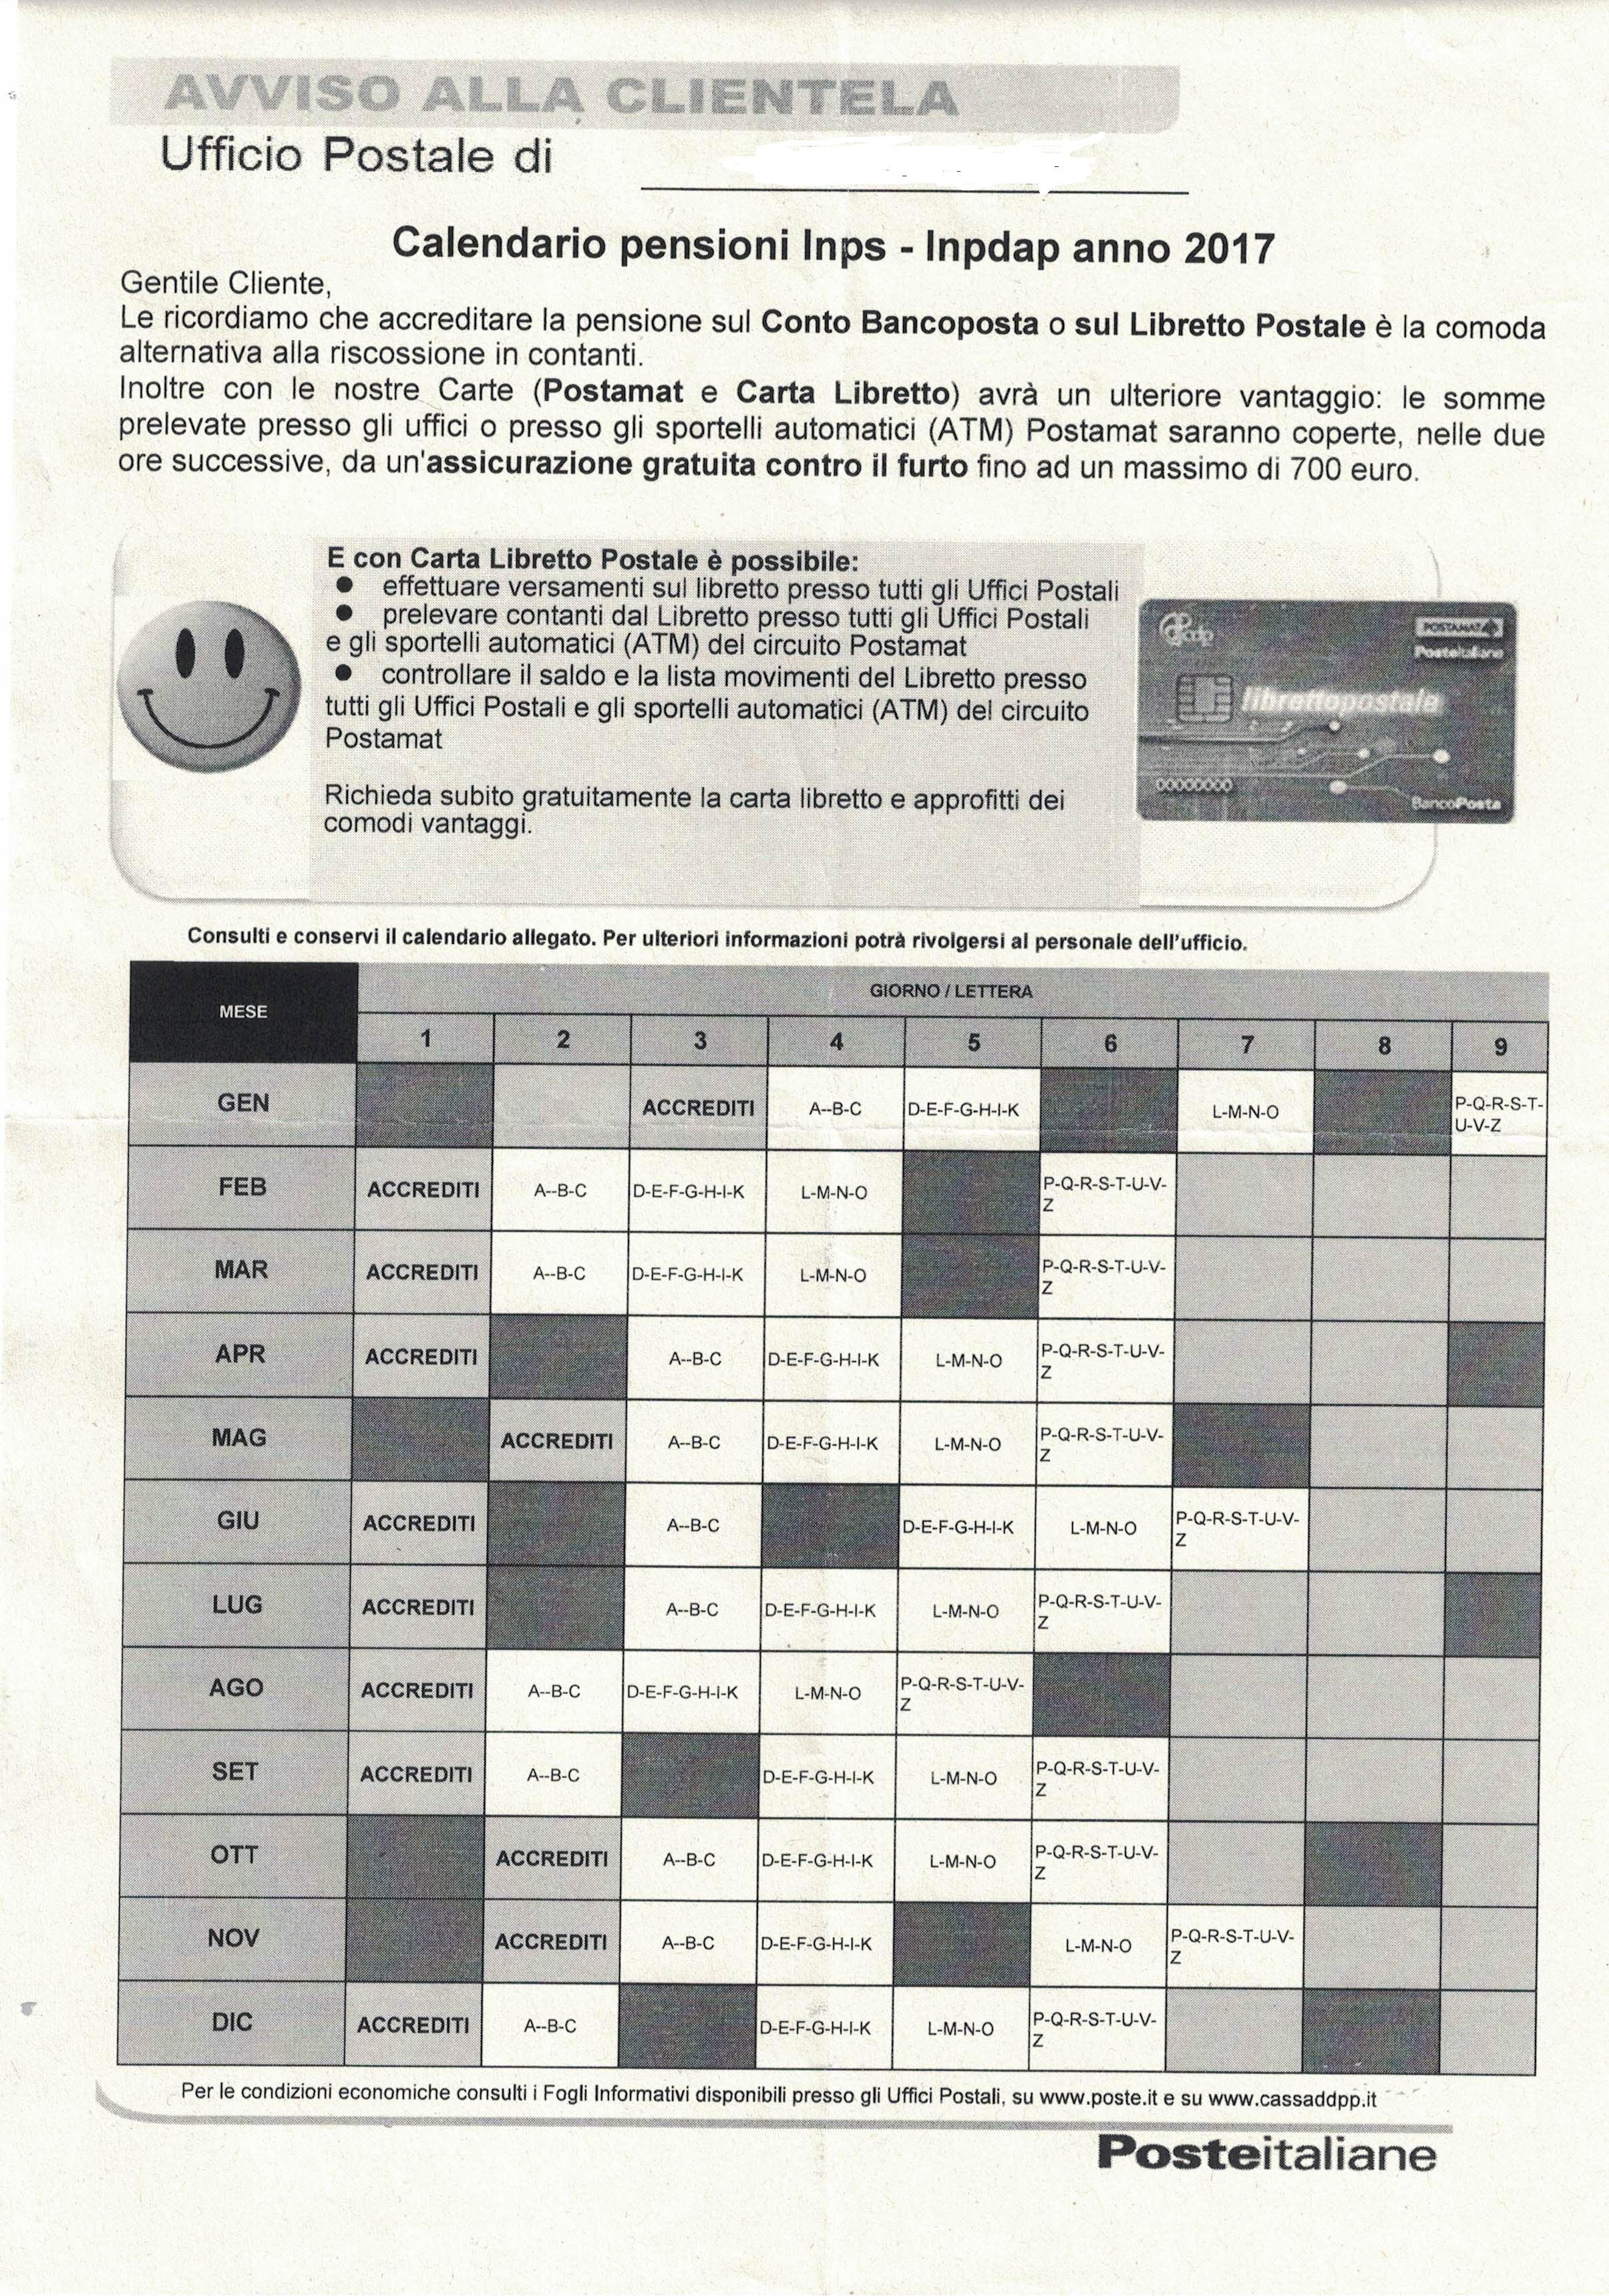 Calendario Pensioni Inps 2020.Poste Italiane Il Nuovo Calendario Pensioni Inps Inpdap